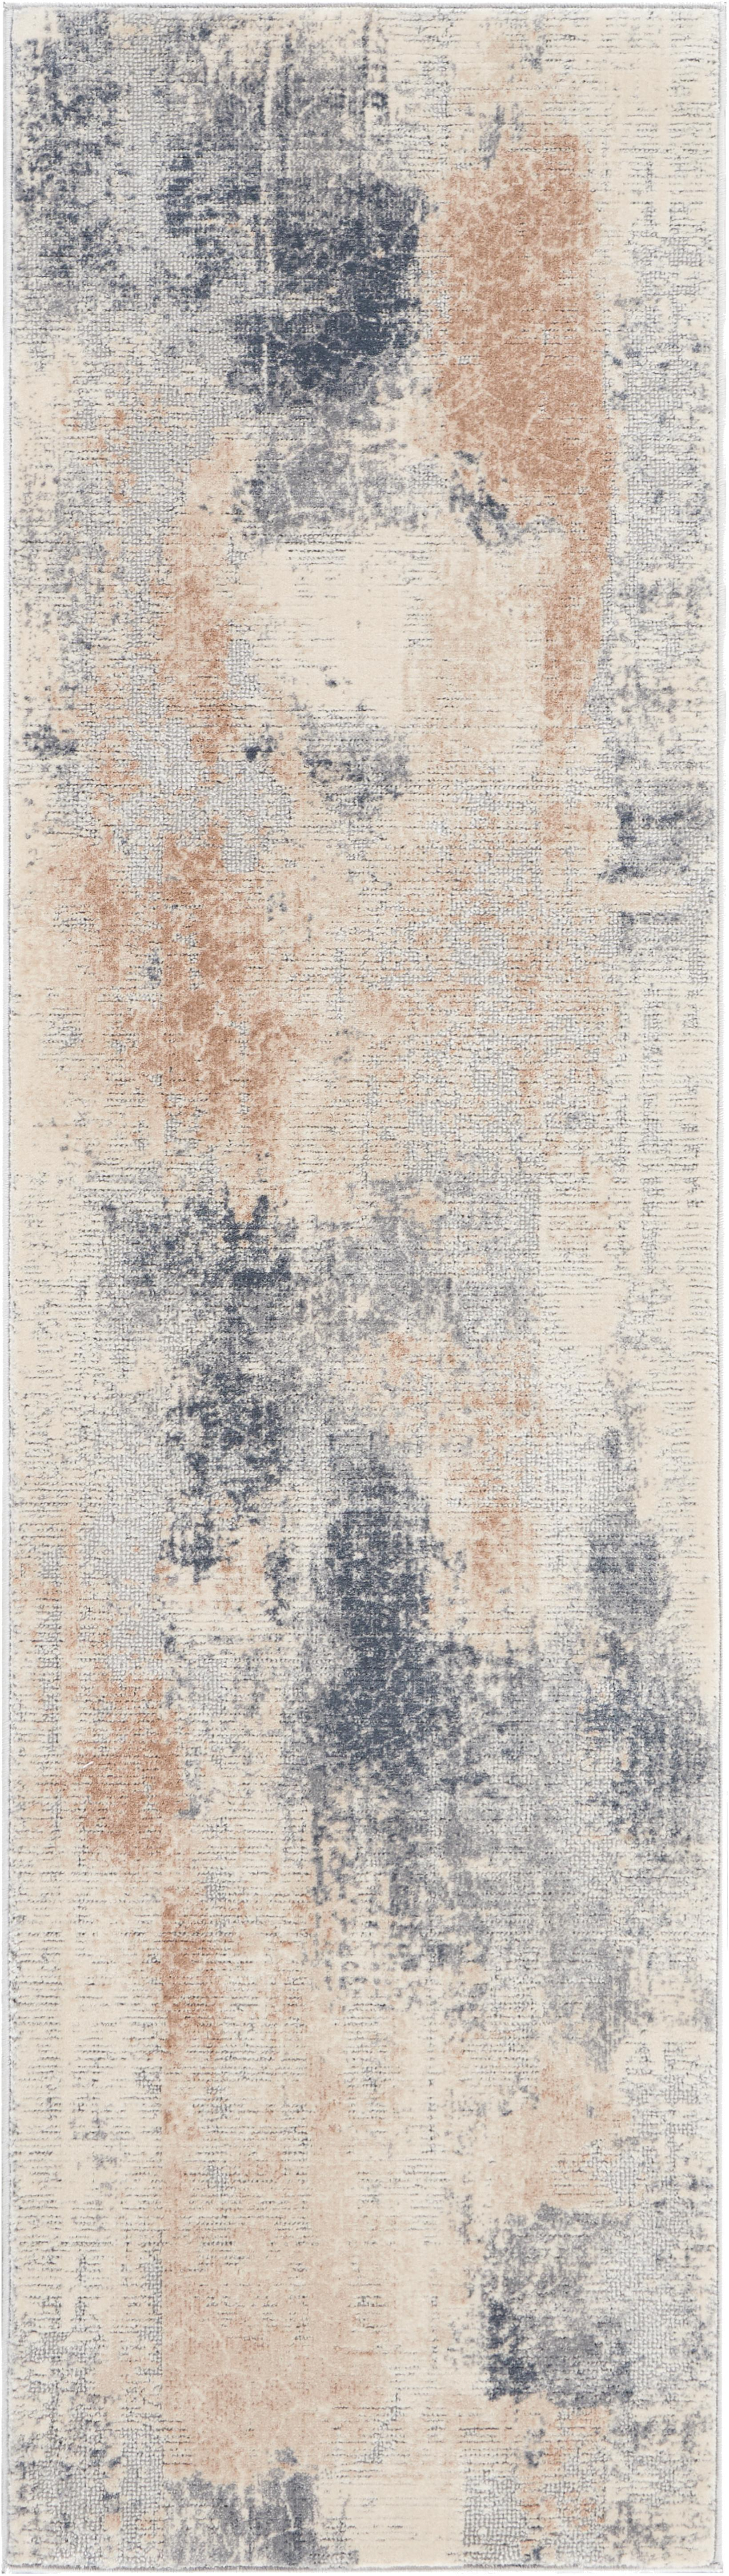 Alfombra de diseño Rustic Textures II, Parte superior: 51%polipropileno, 49%po, Reverso: 50%yute, 50%látex, Tonos beige, gris, An 70 x L 230 cm